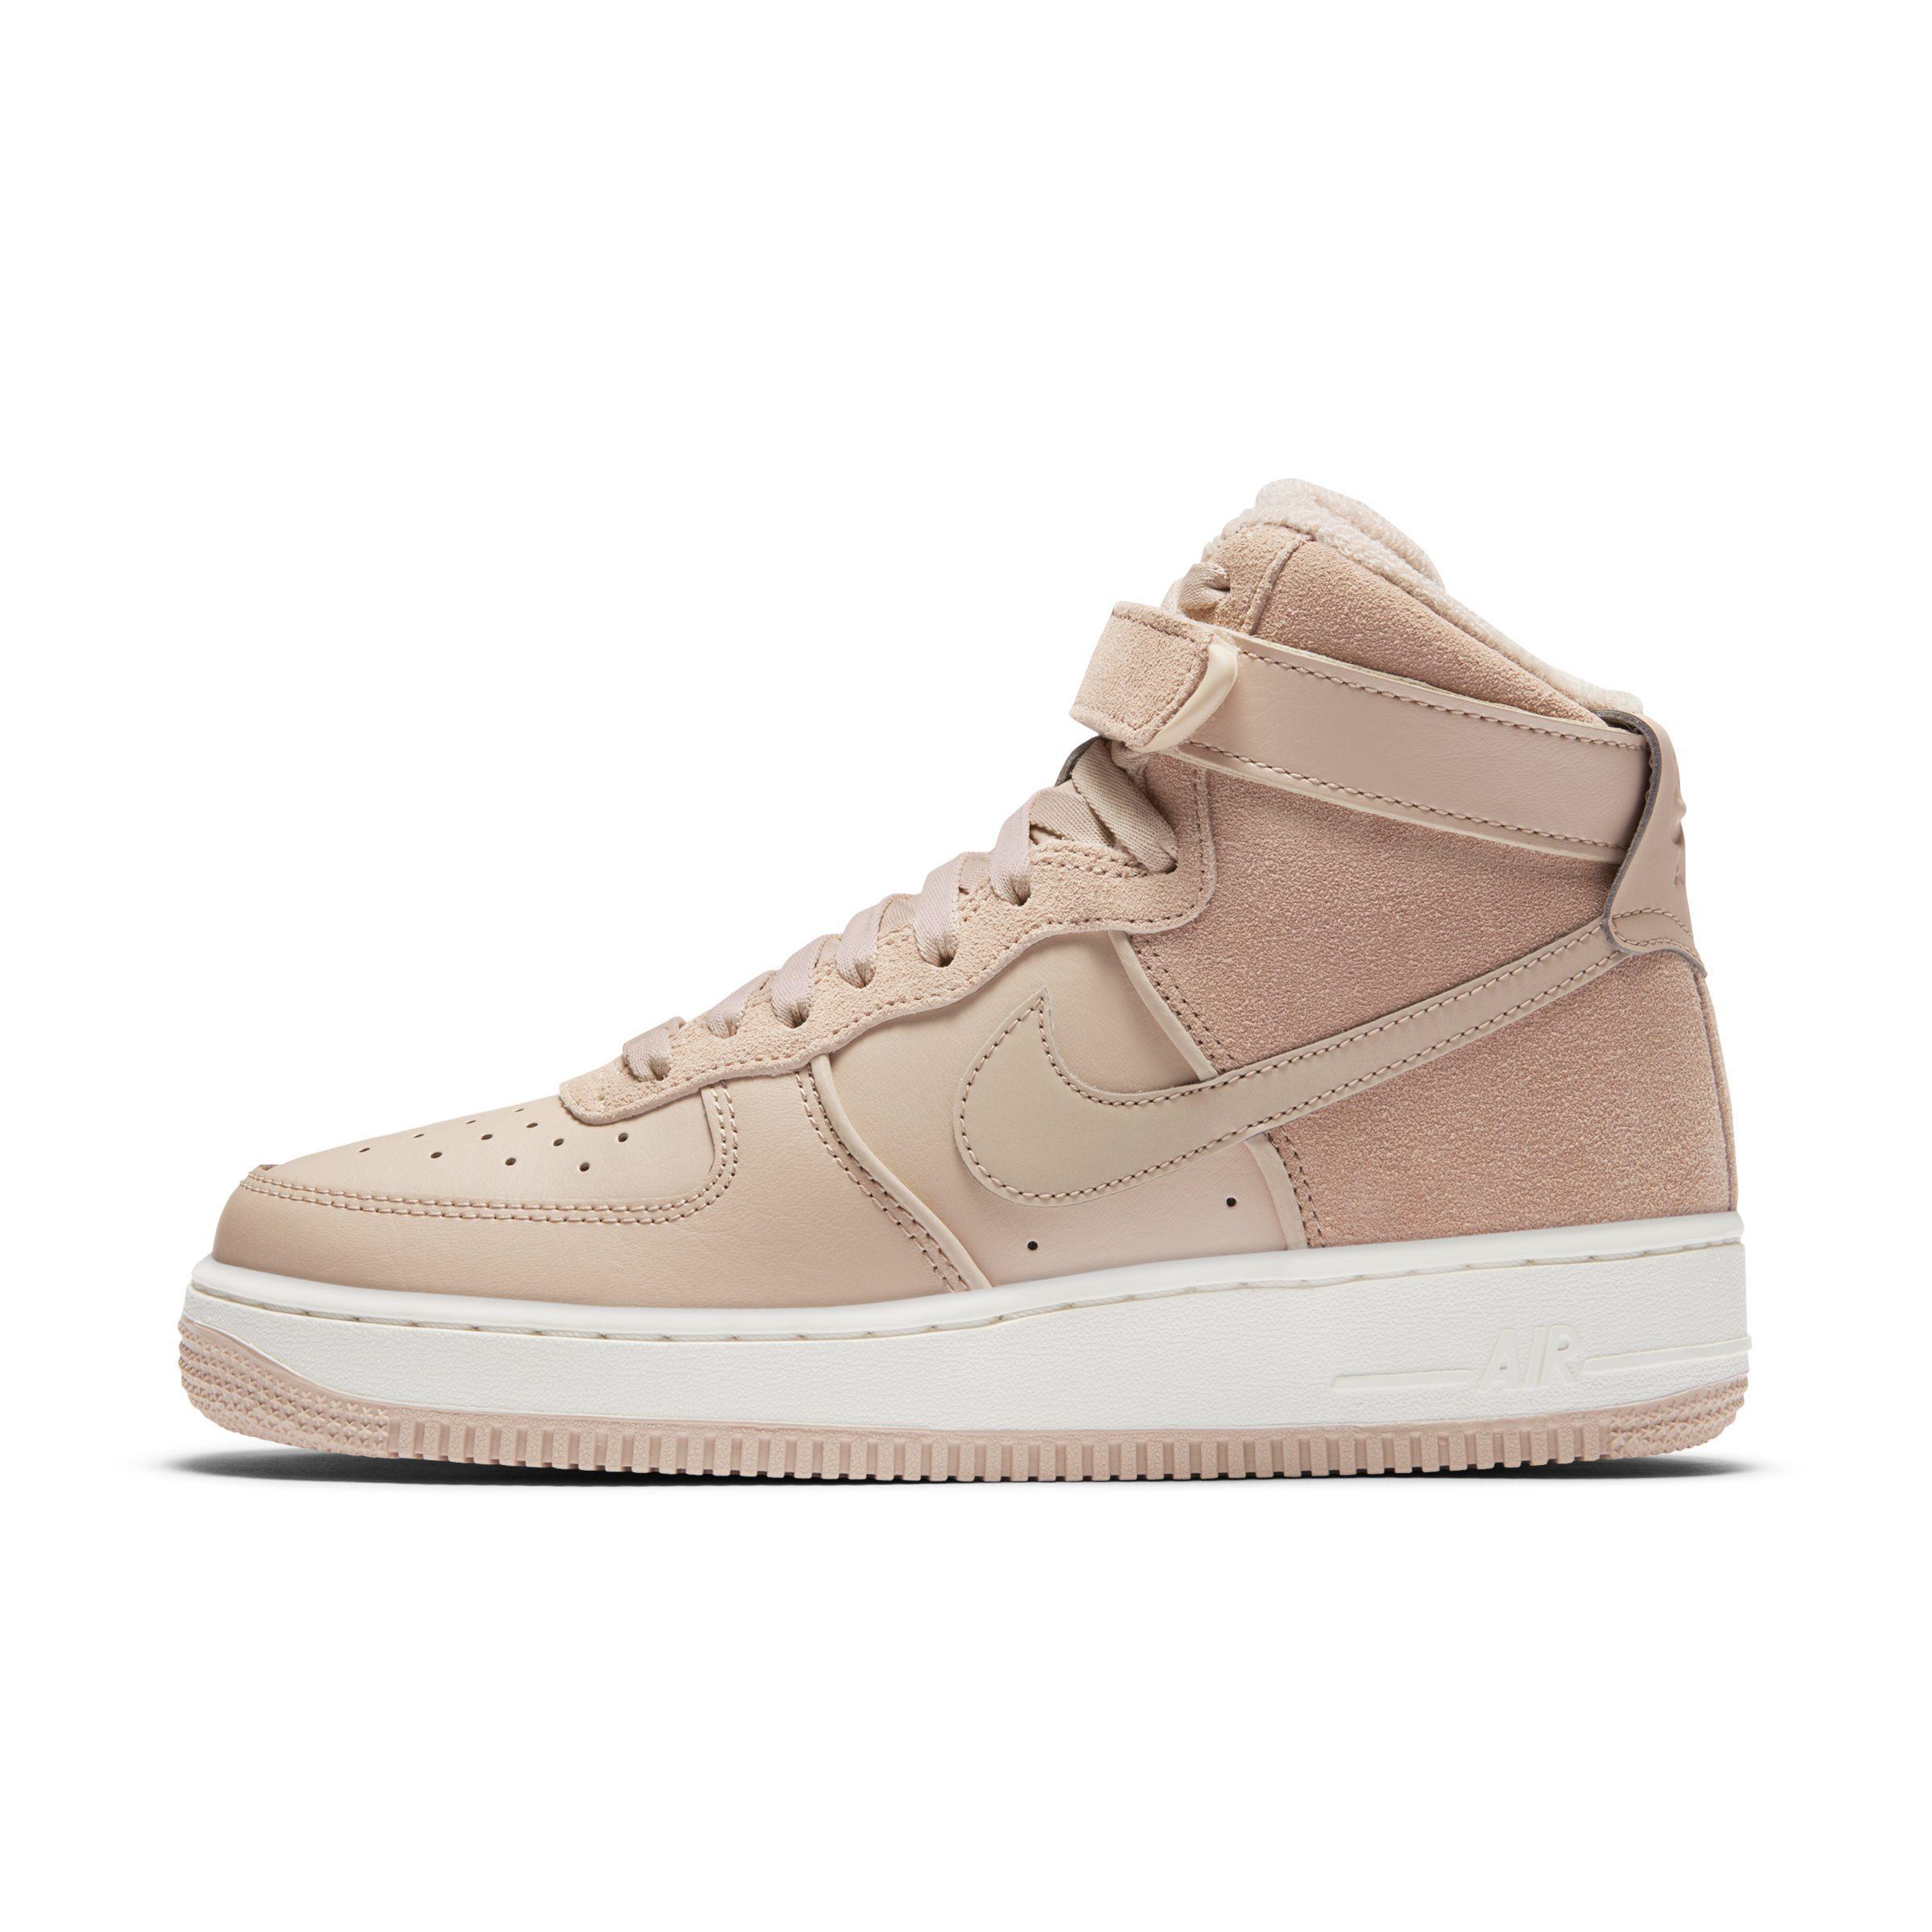 Air Force Winterized Brown High 1 Shoe Nike n0kNXP8wO